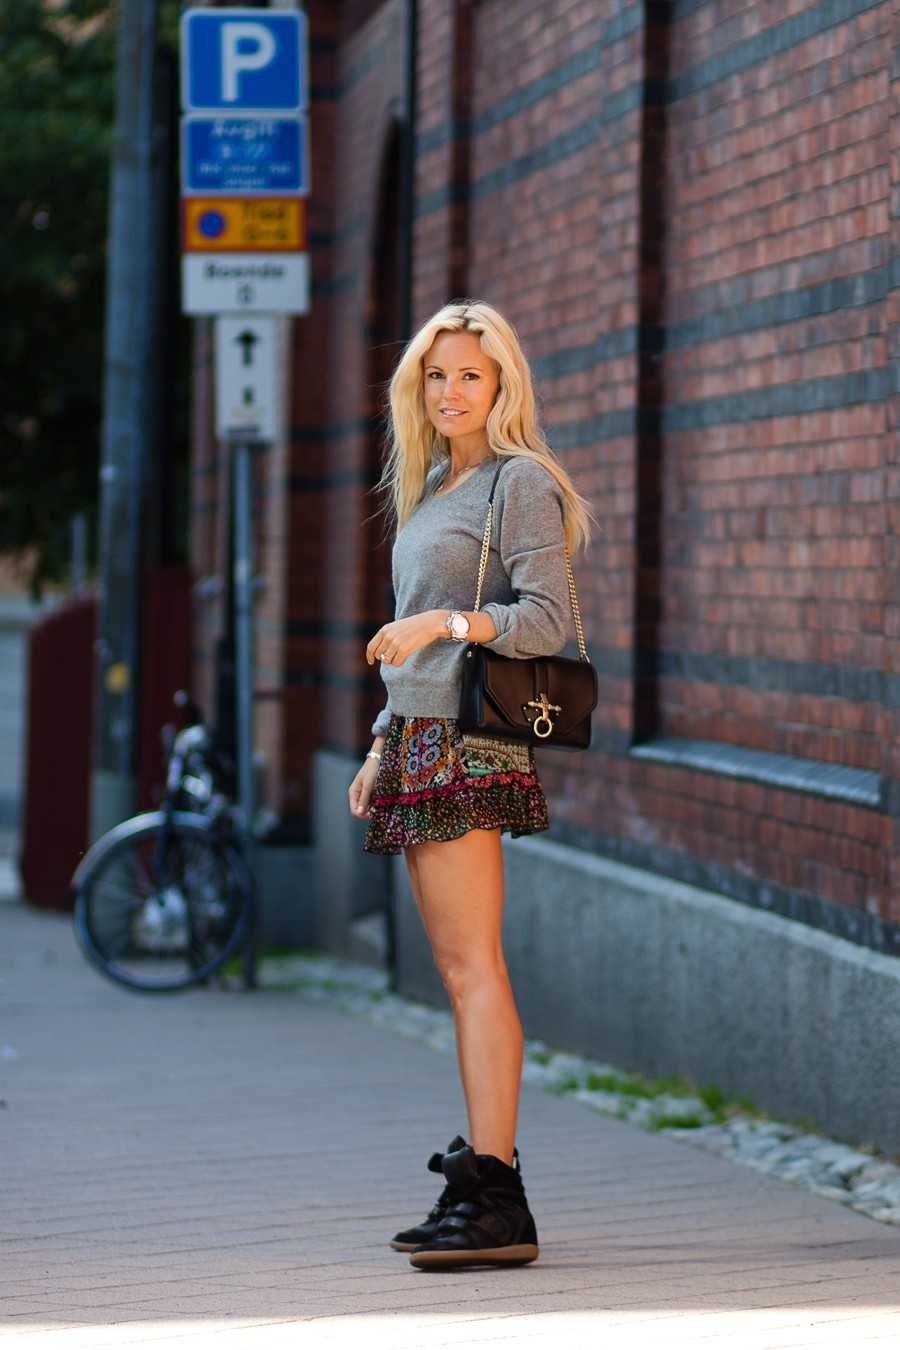 Tröja - BLK DNM, Kjol - Topshop, Sneakers - Isabel Marant.